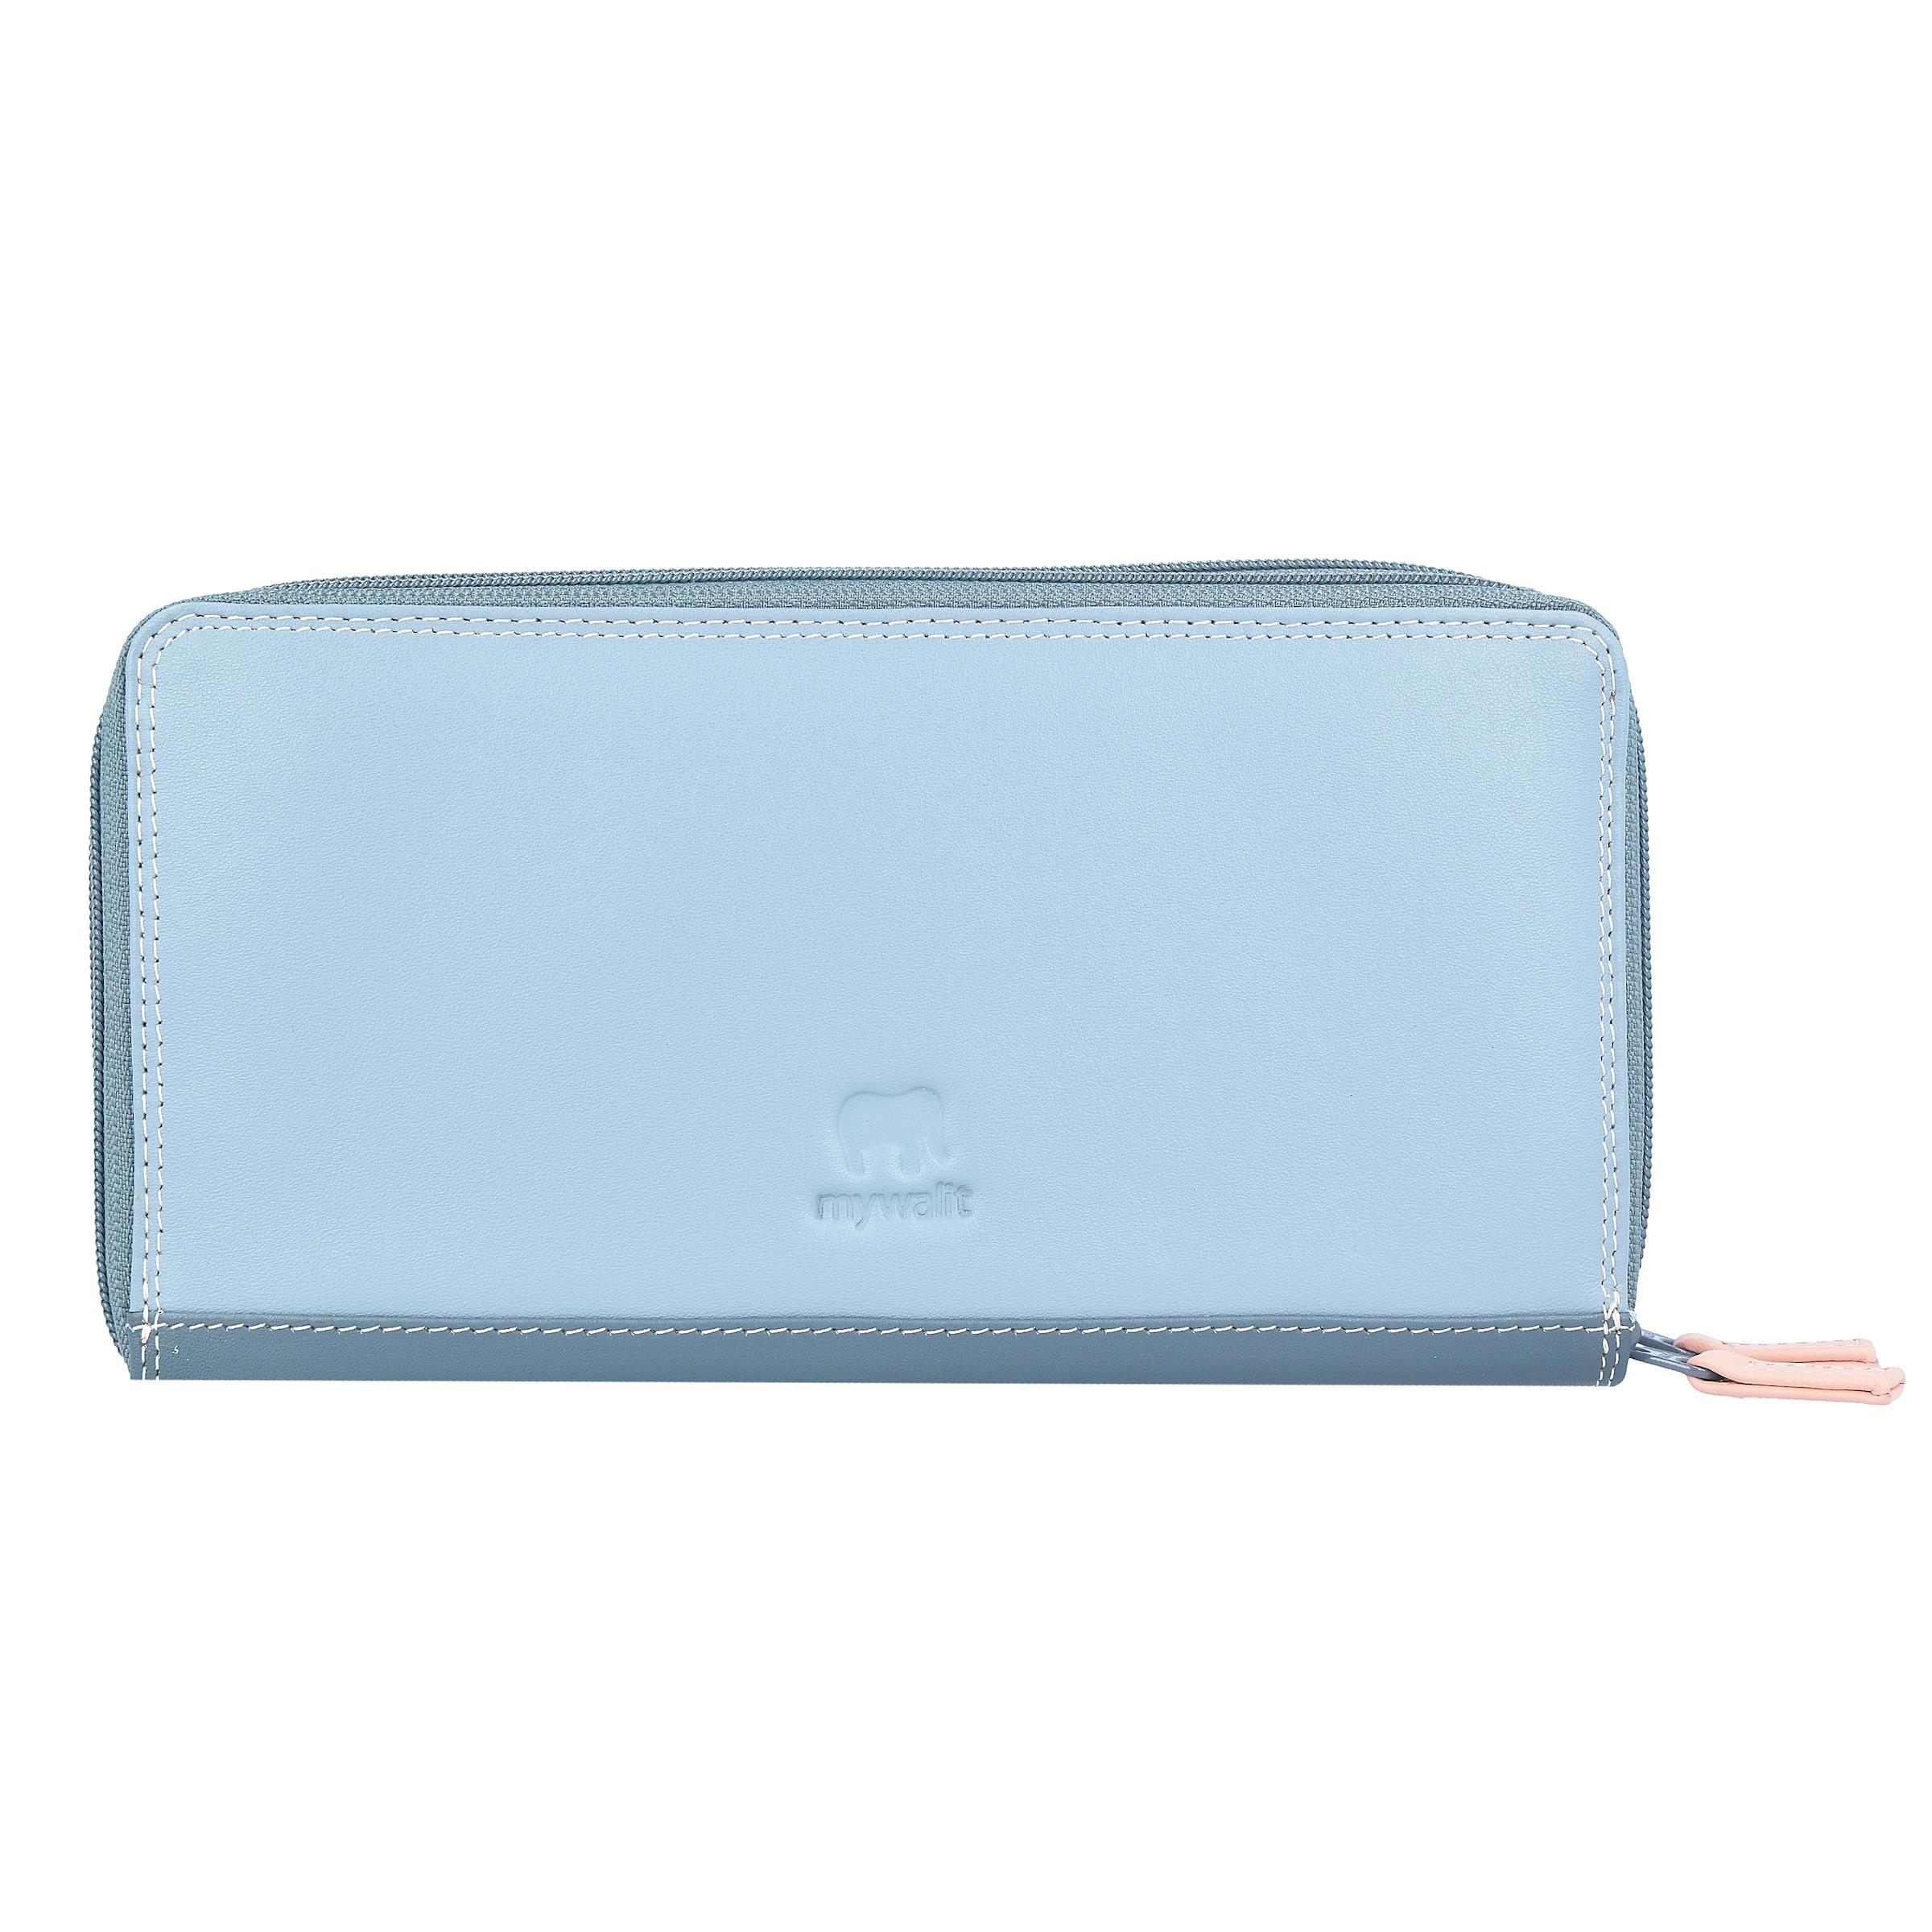 fold' 'medium monnaies En Gris Mywalit Tri Porte Abricot PastelClair Bleu Melon OTPkXZuiwl